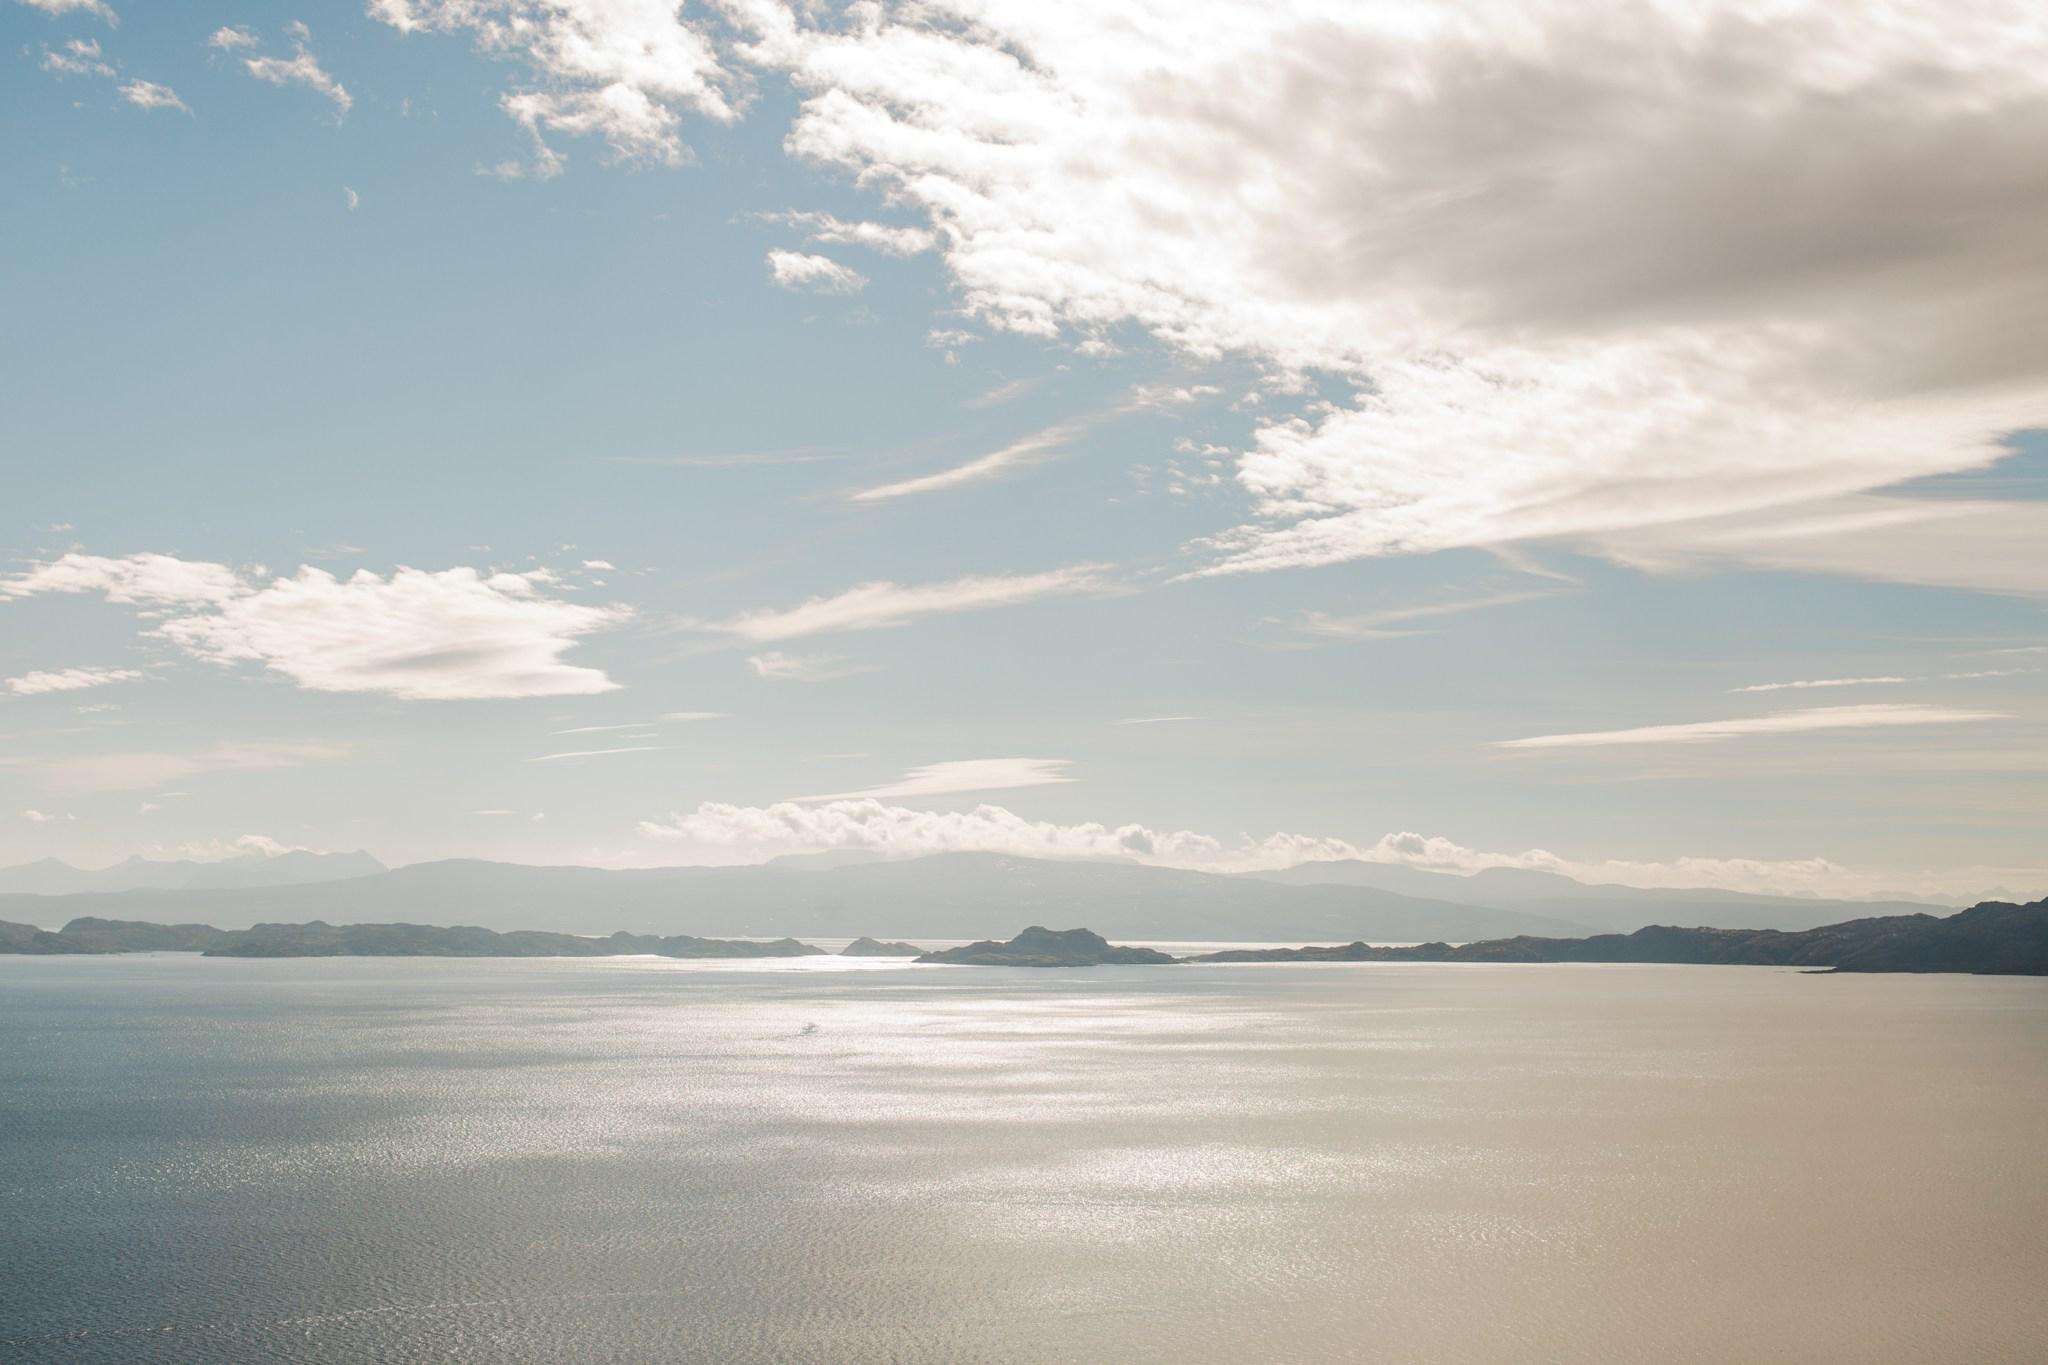 scotland_highlands_deborah_zoe_0056.JPG